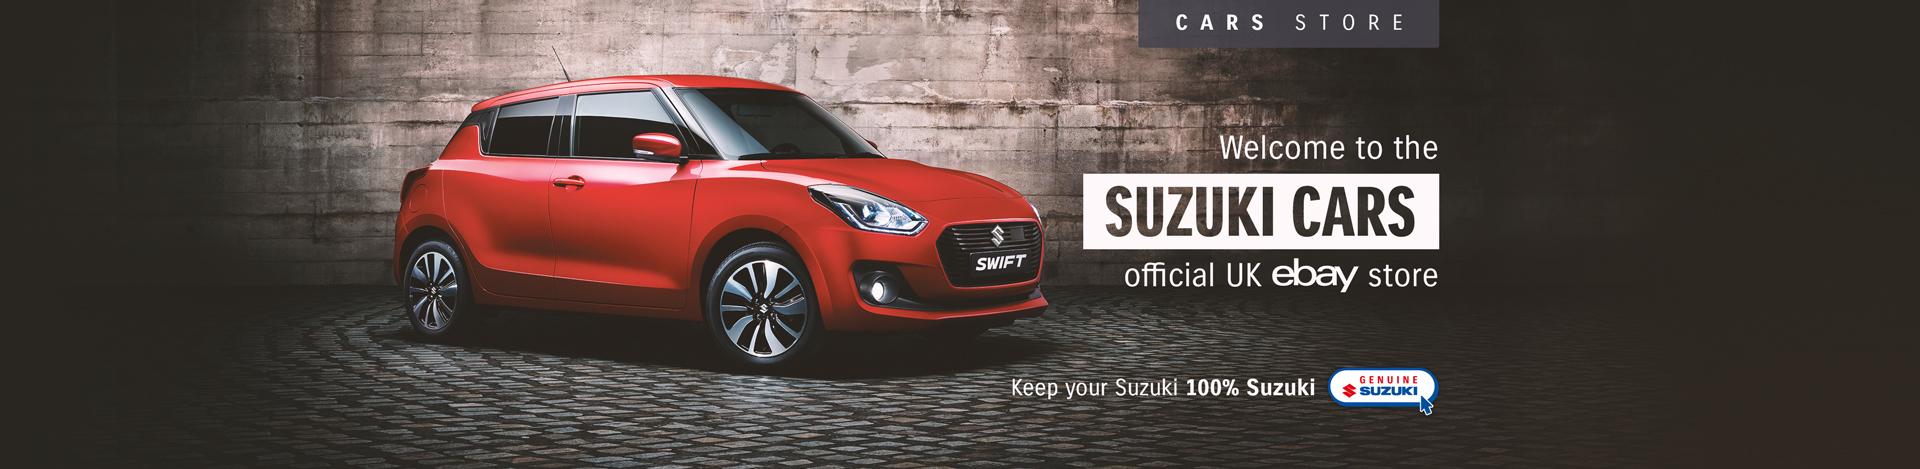 Suzuki Cars UK Official | eBay Shops